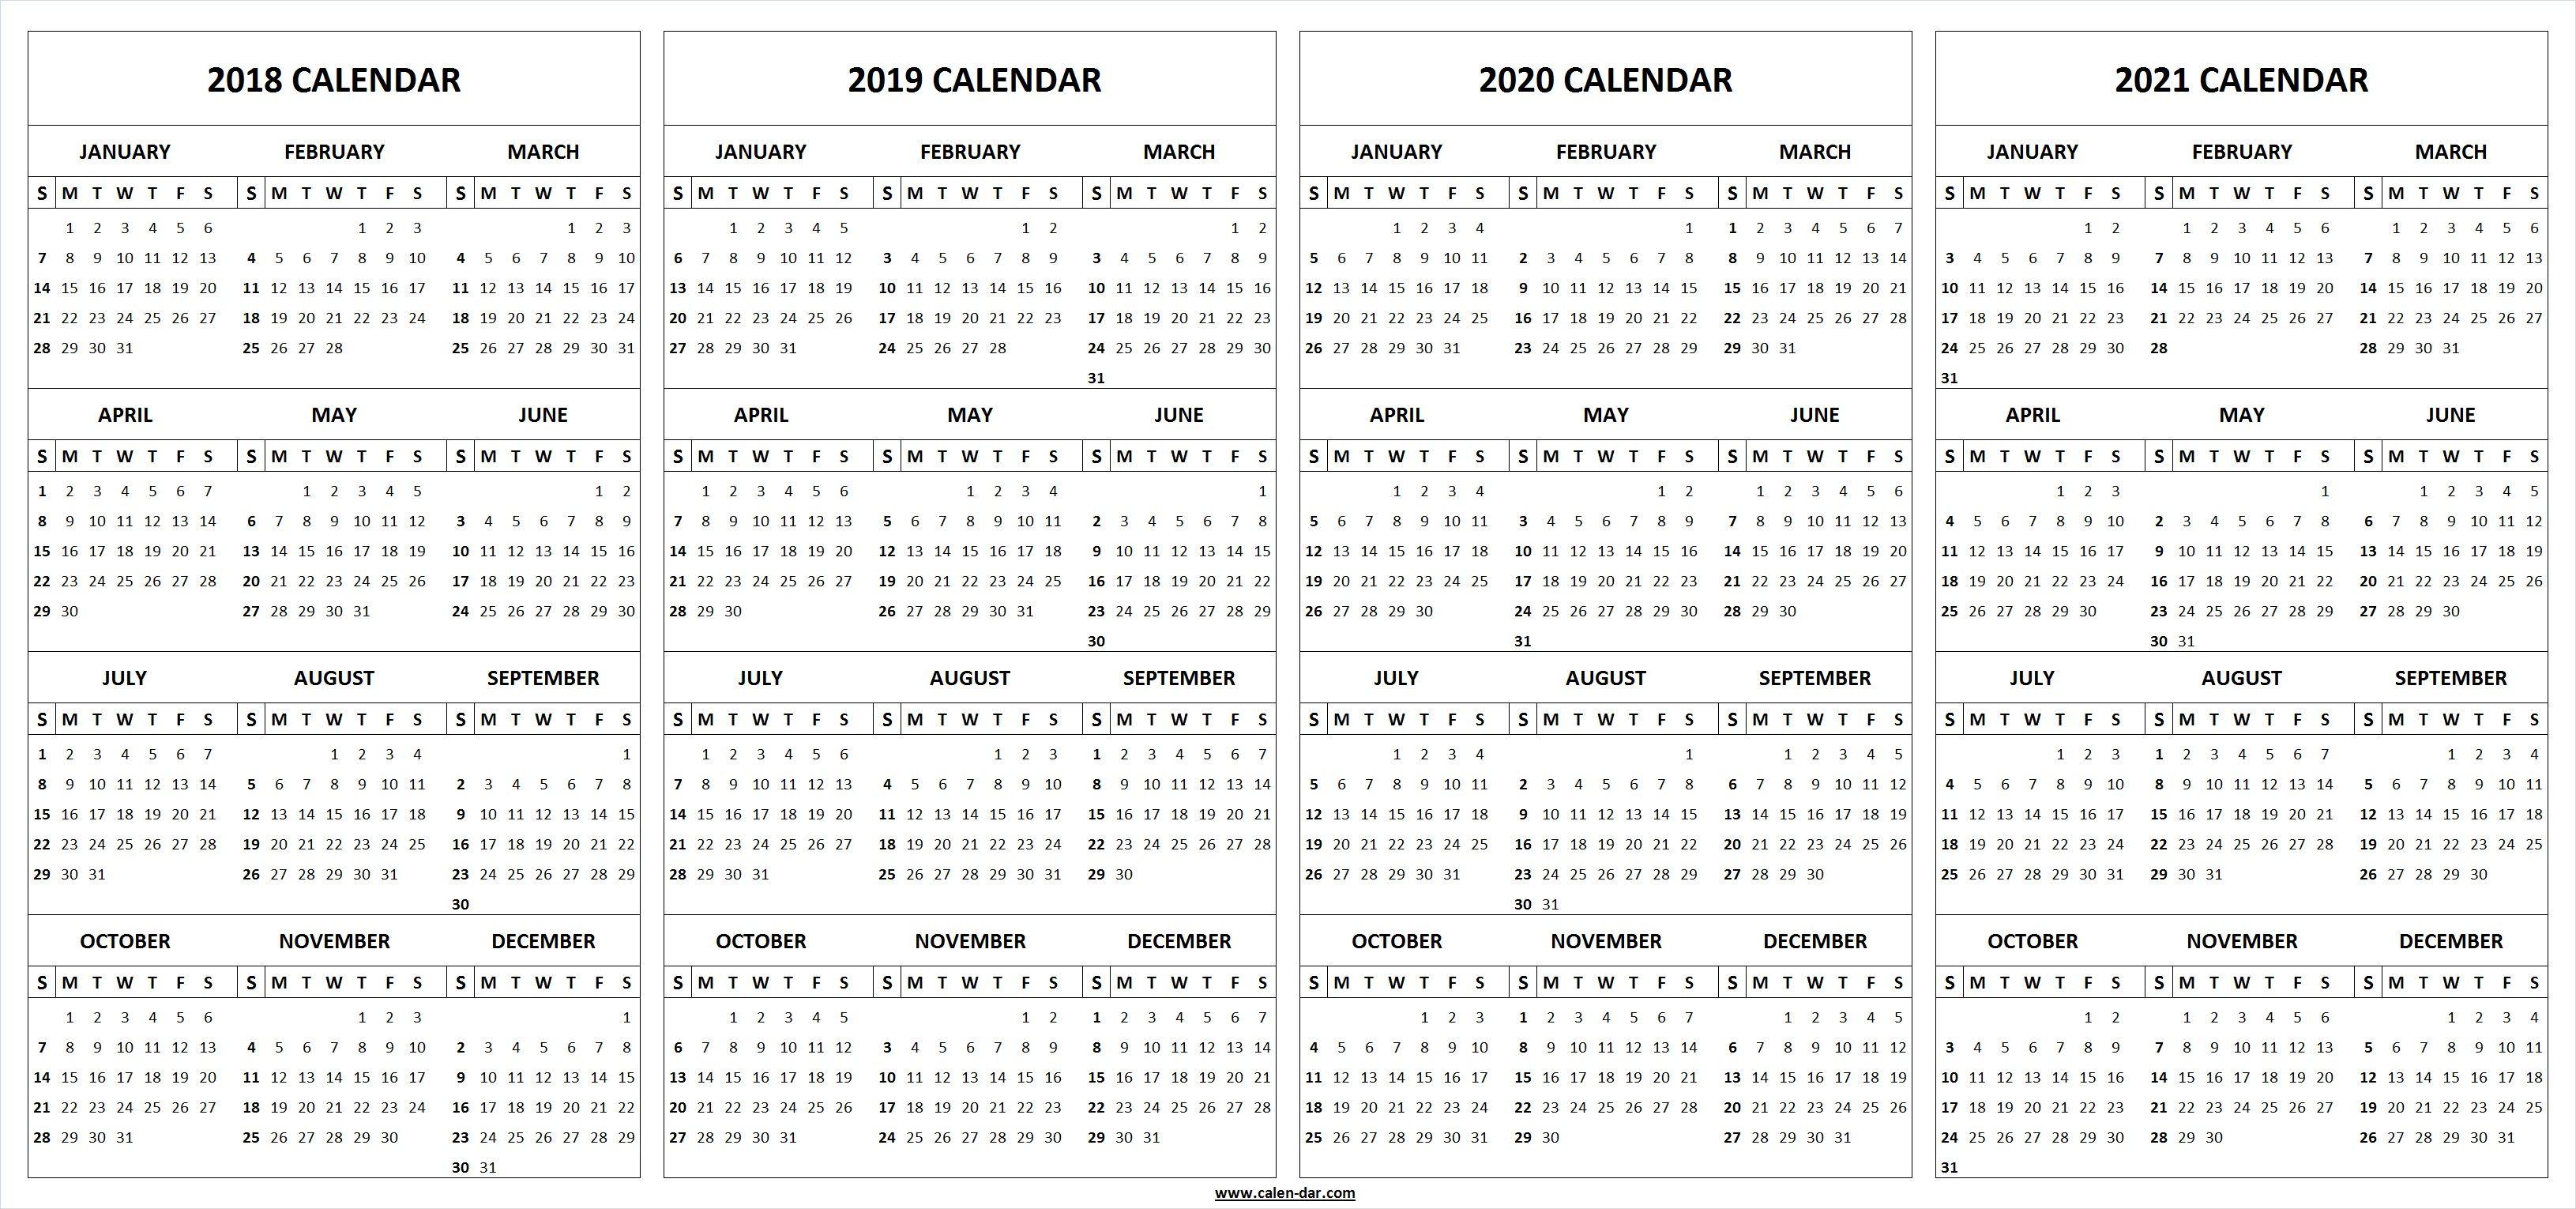 4 Four Year Calendar Printable Template